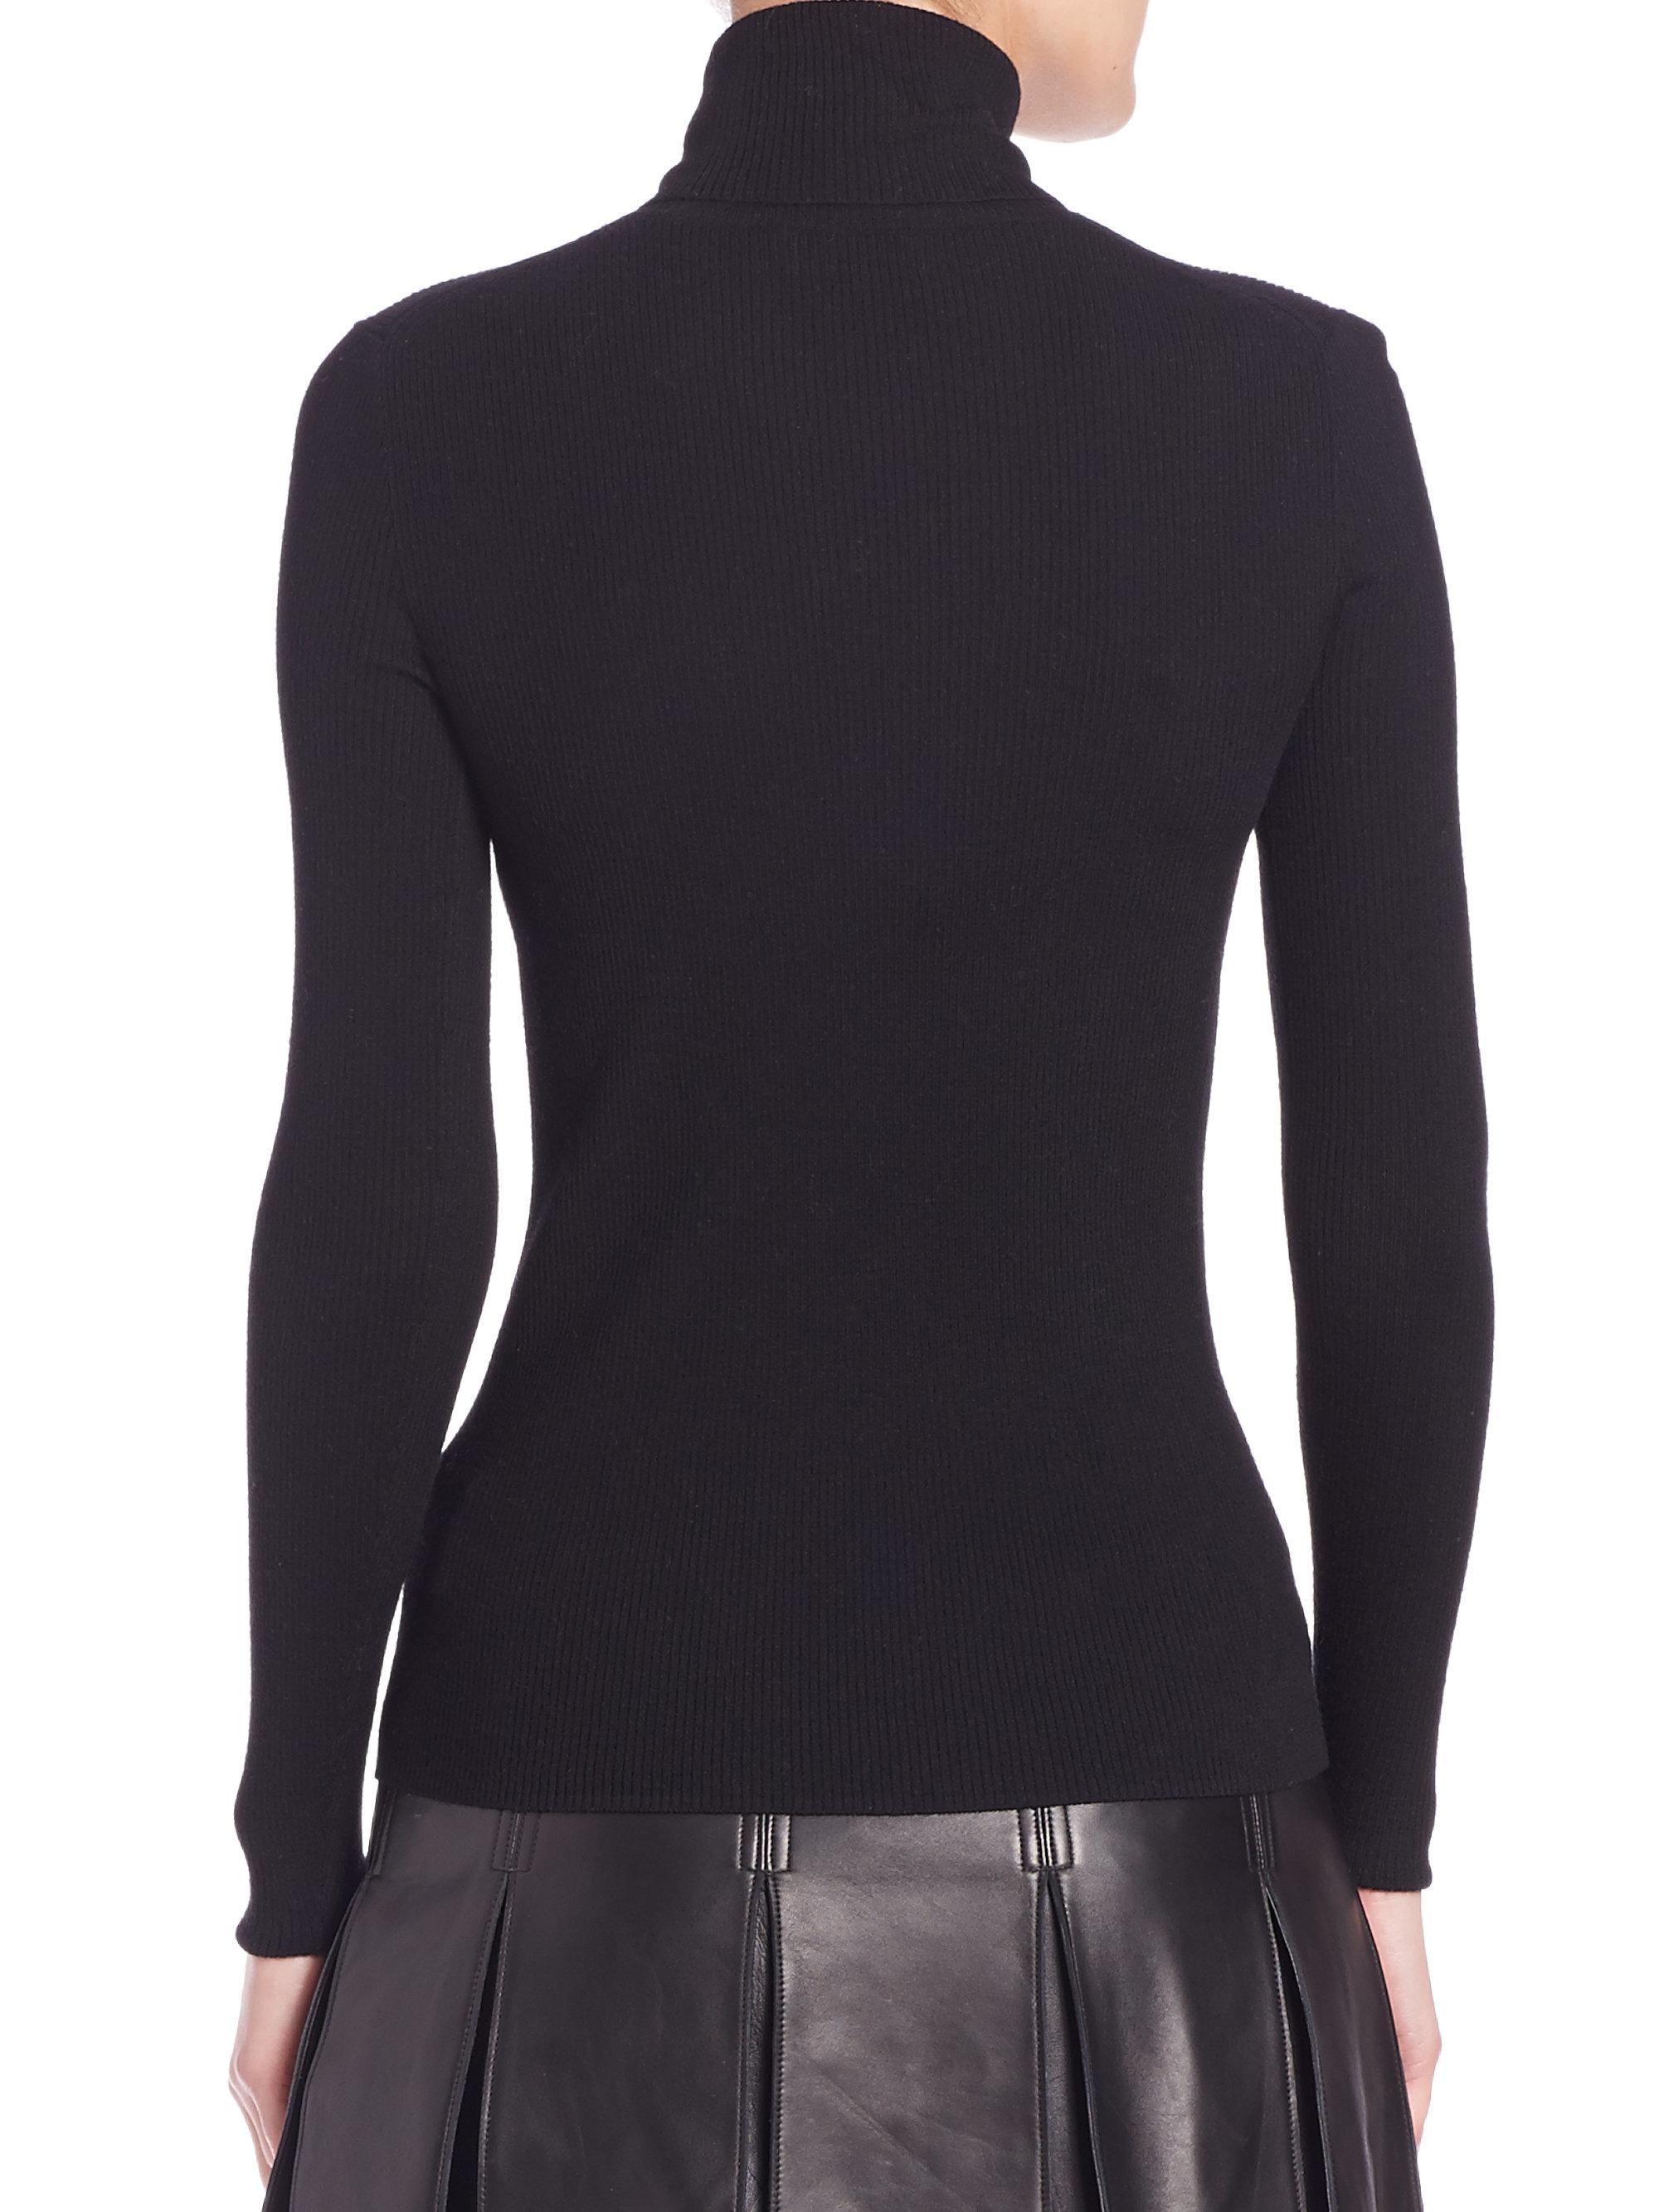 Polo ralph lauren Merino Wool Turtleneck Sweater in Black | Lyst